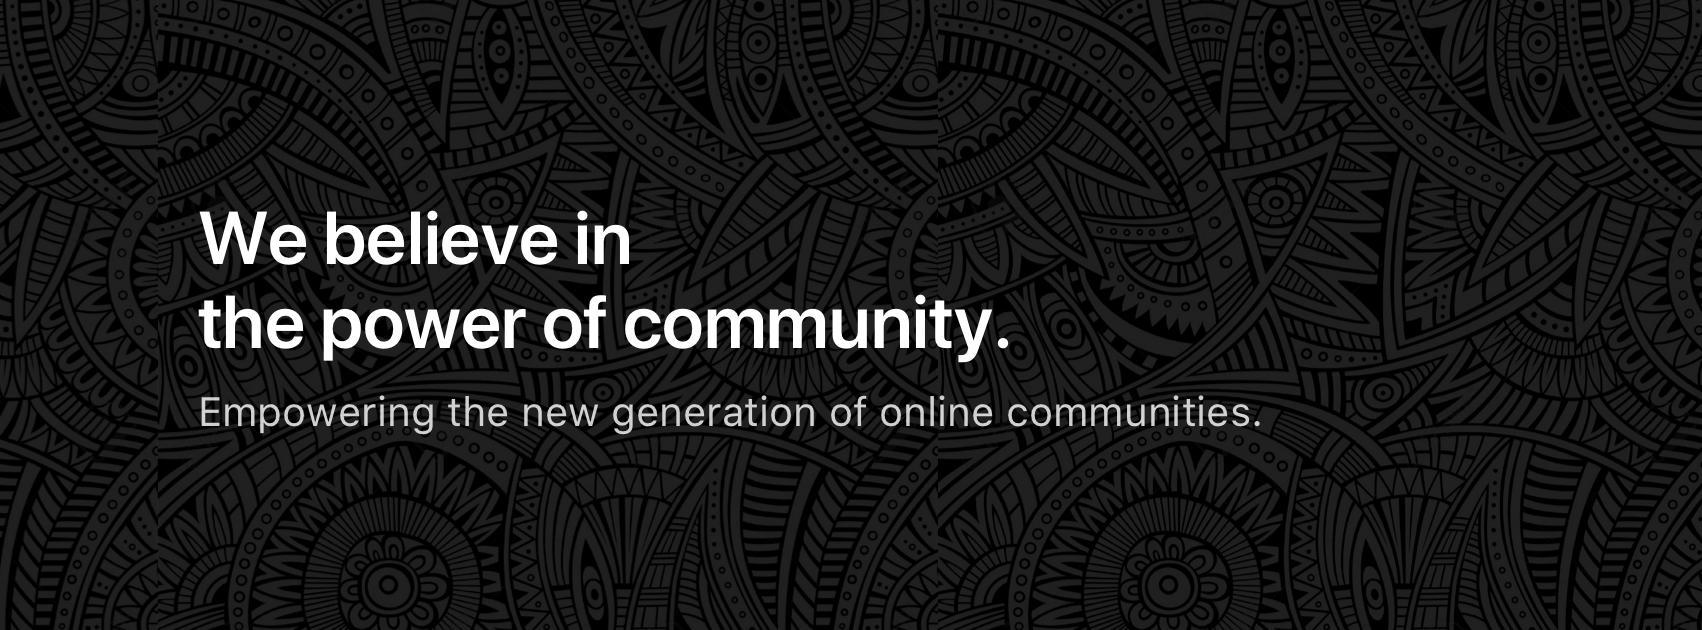 Review Tribe Community Platform: Customisable Community Platform to Create Online Communities - appvizer